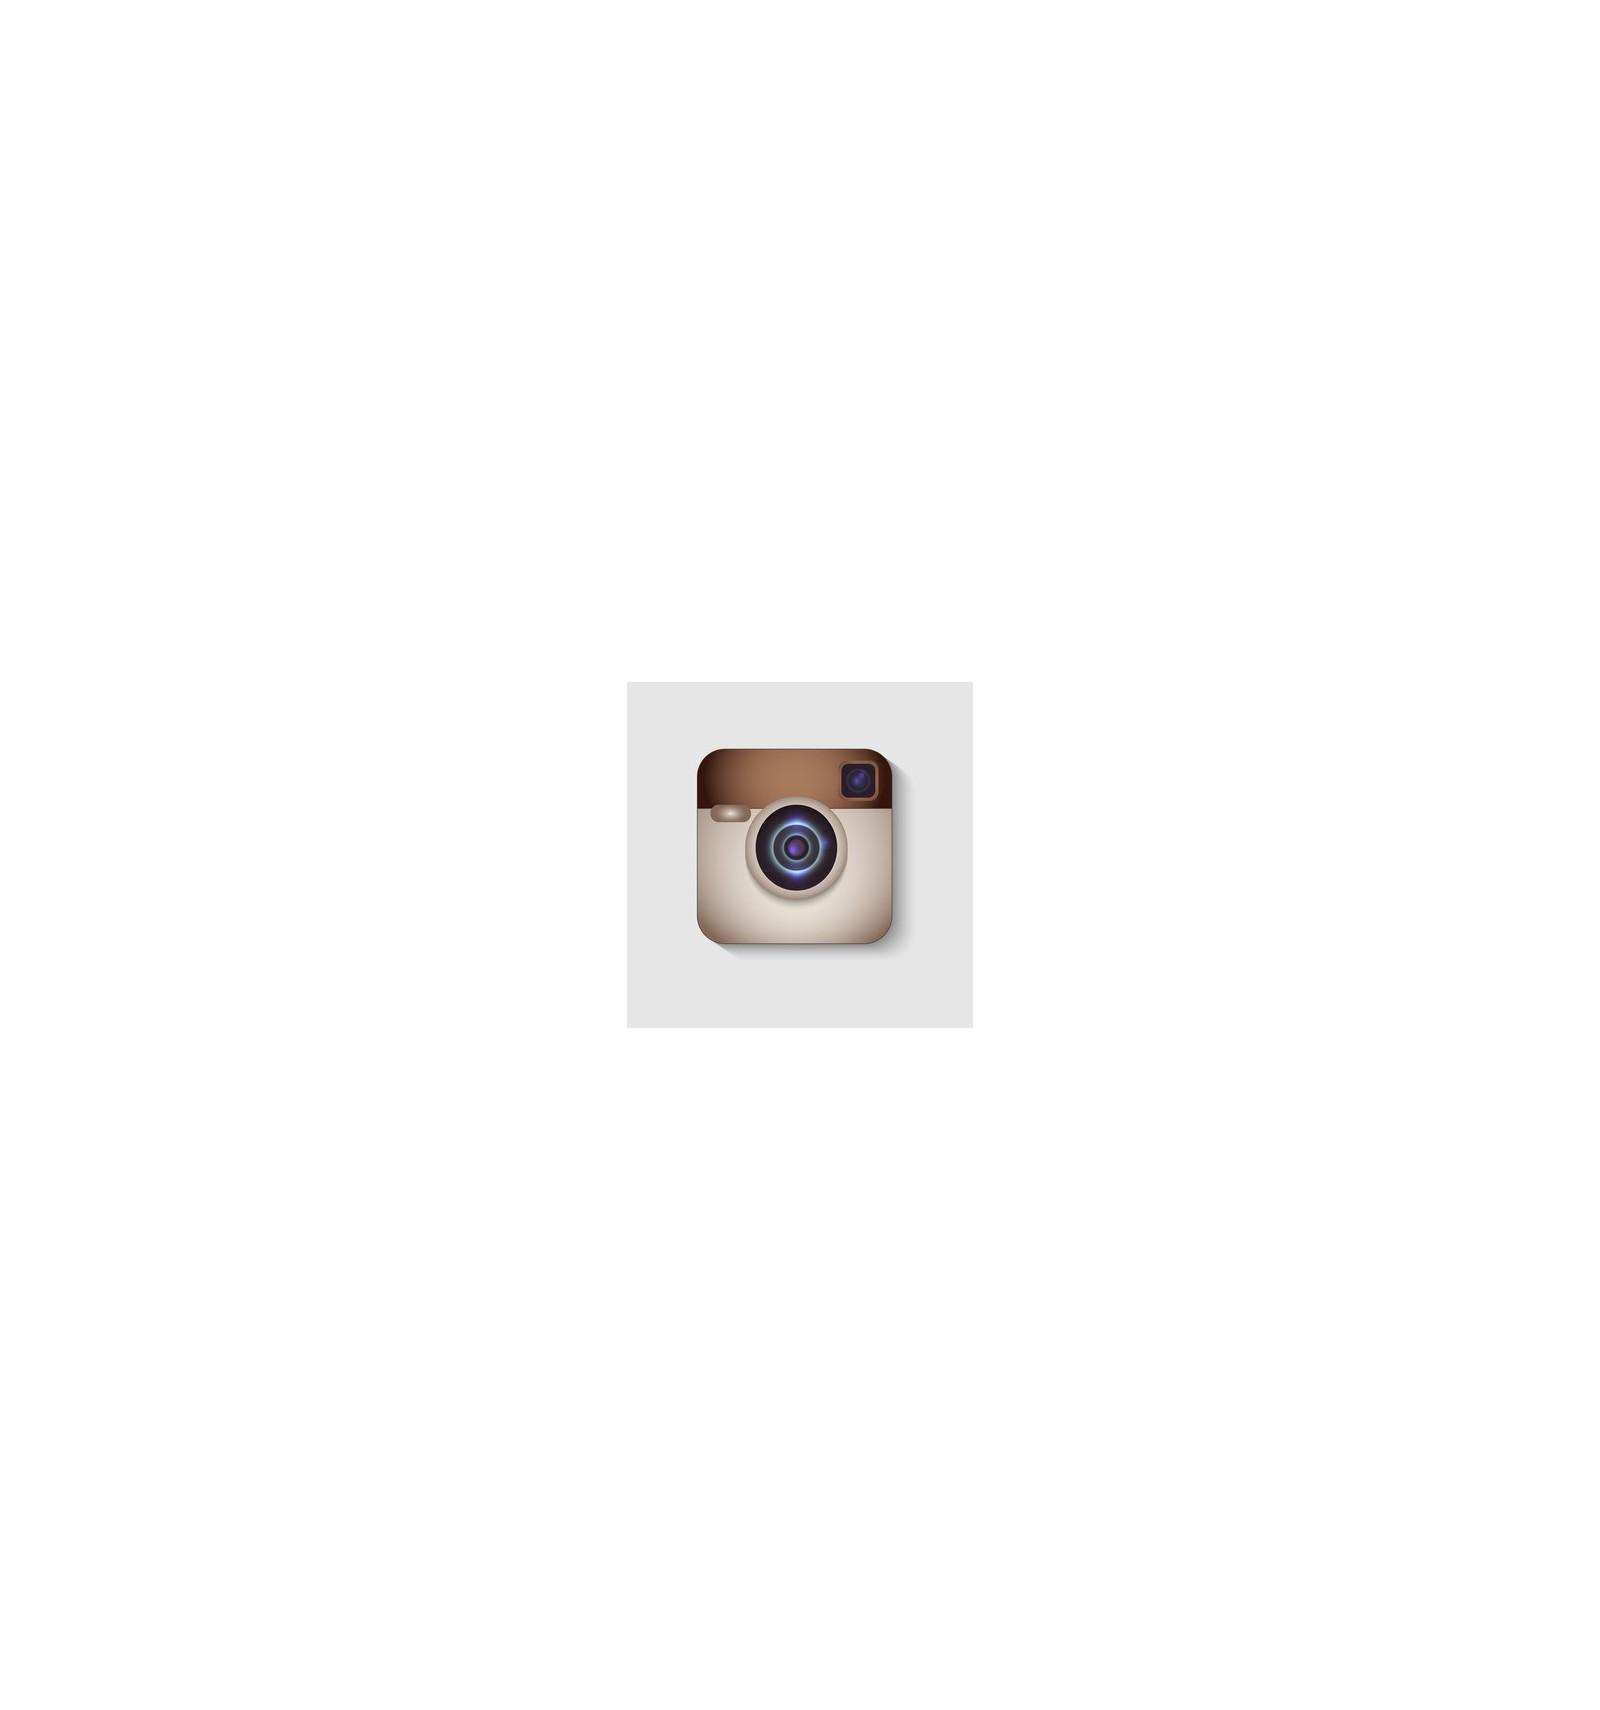 100 international female Instagram Follower